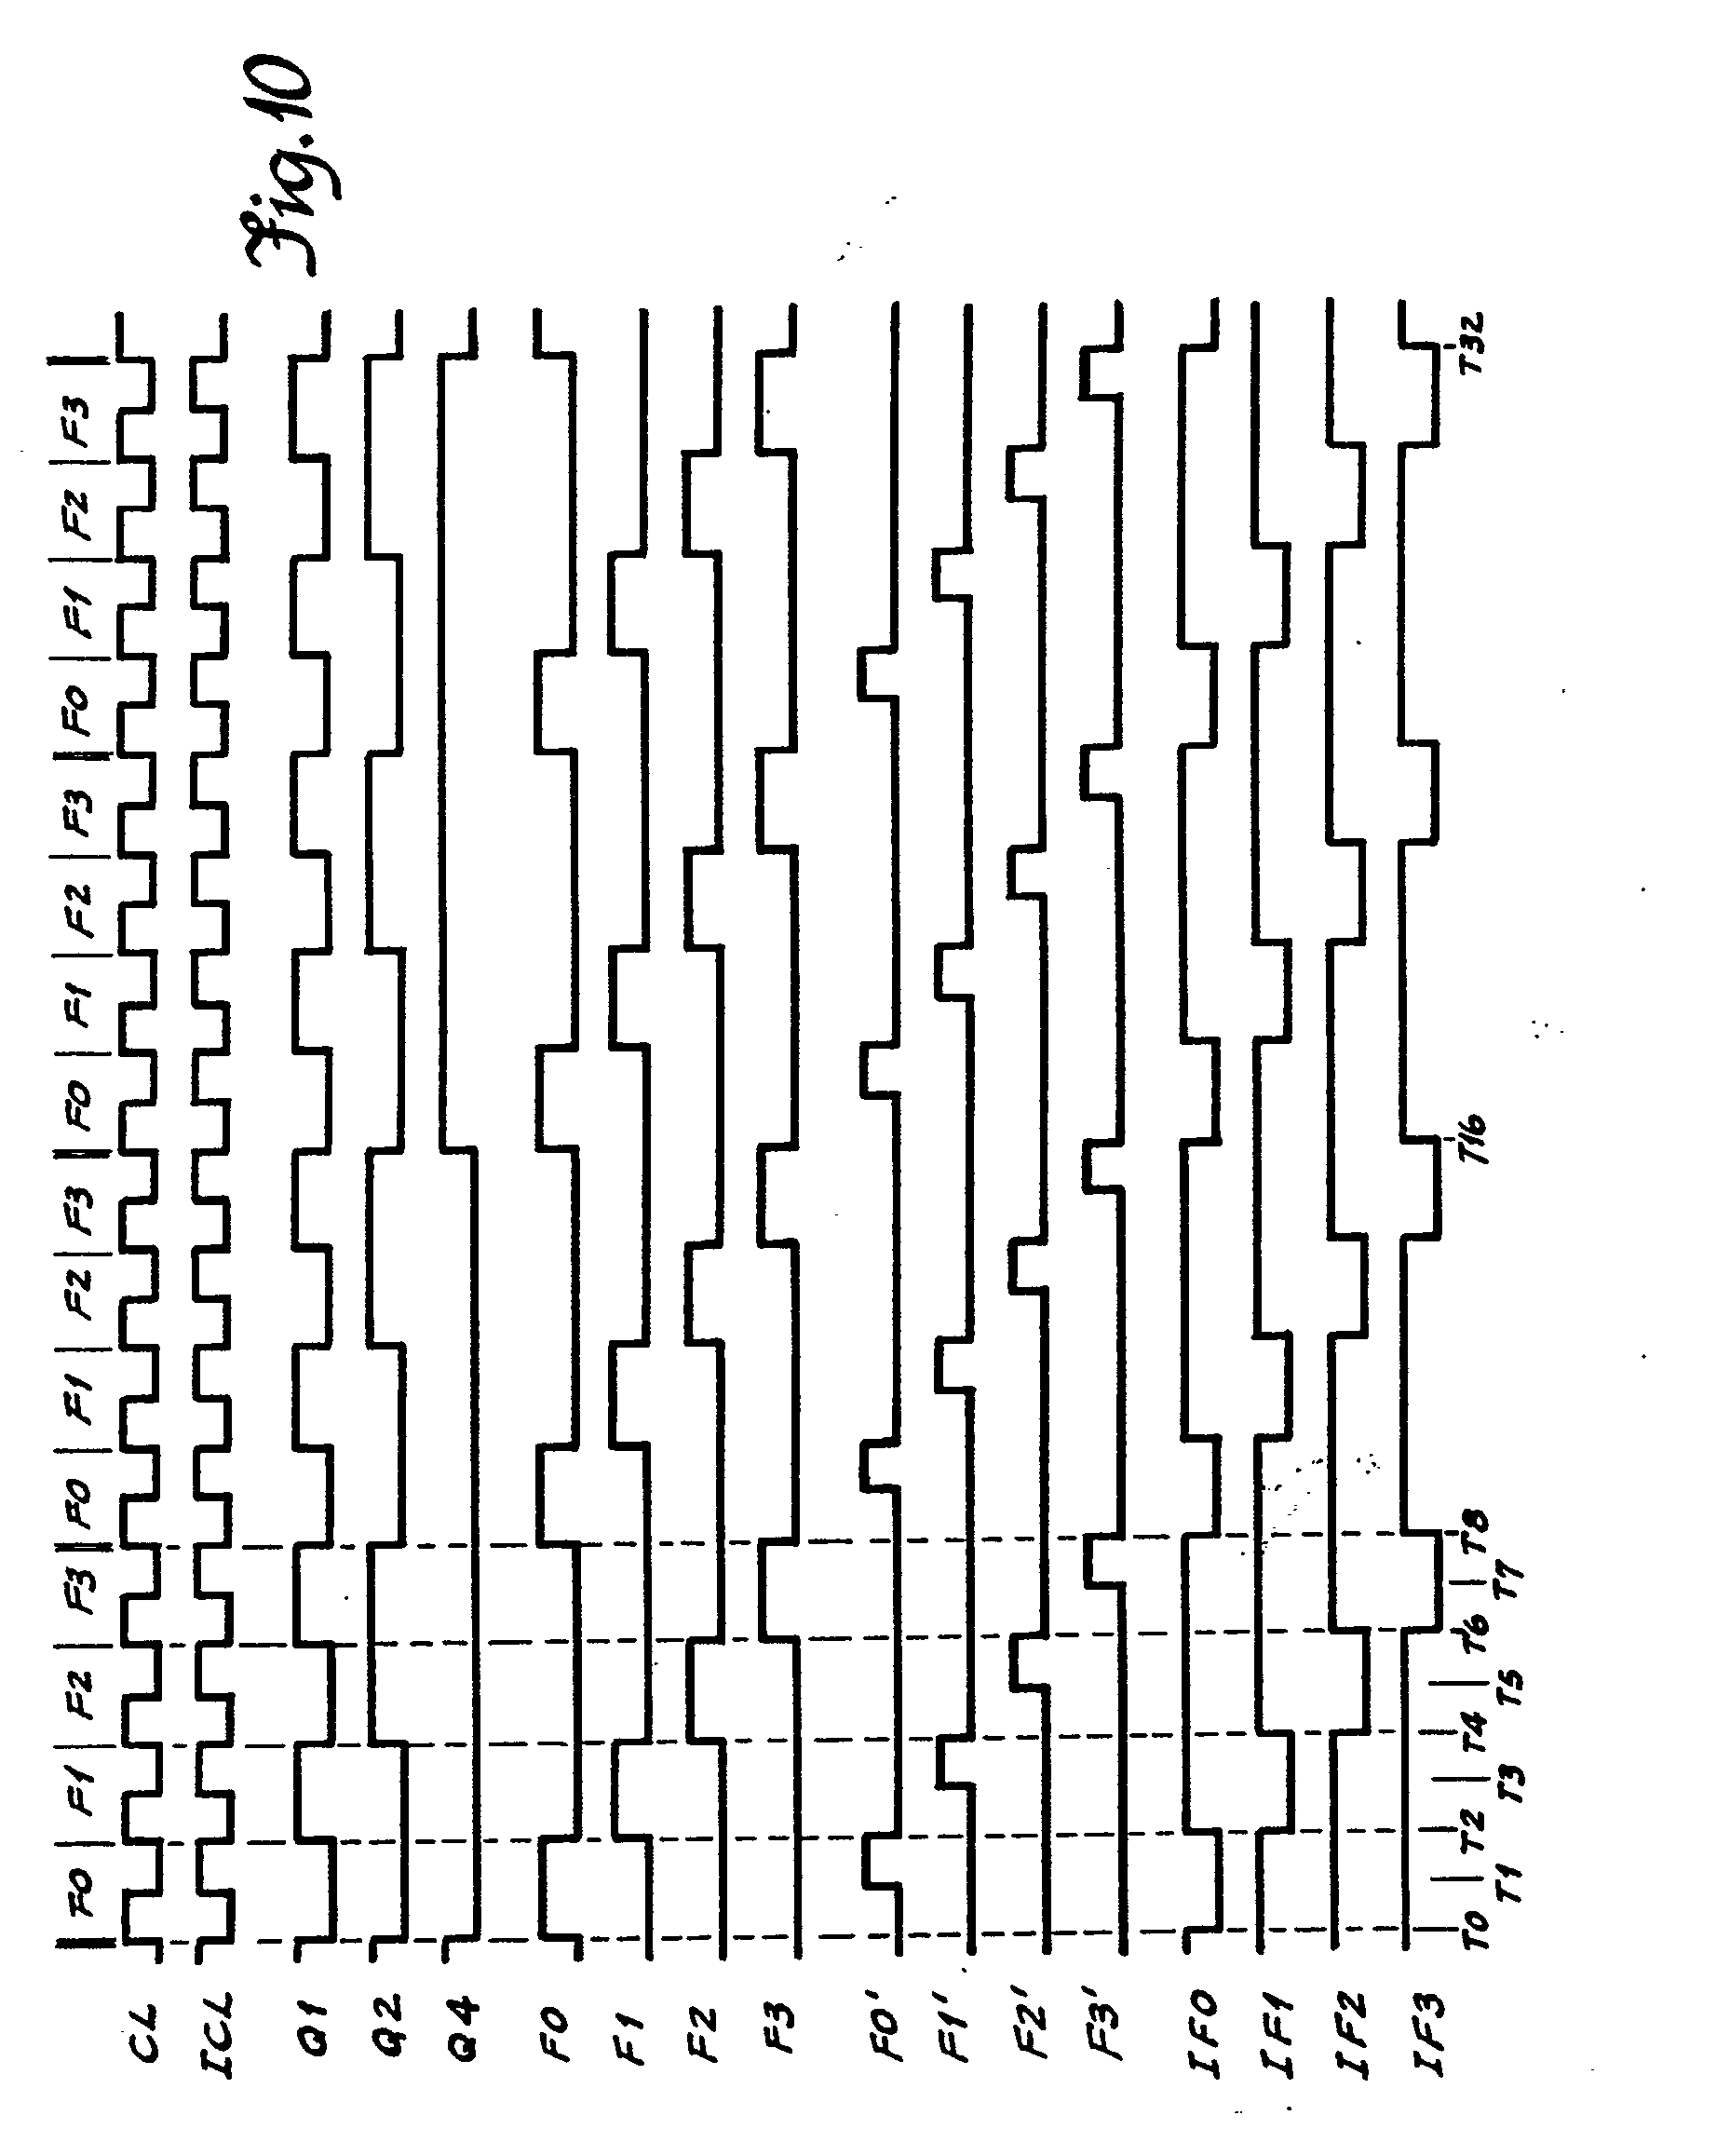 patent ep0002138b1